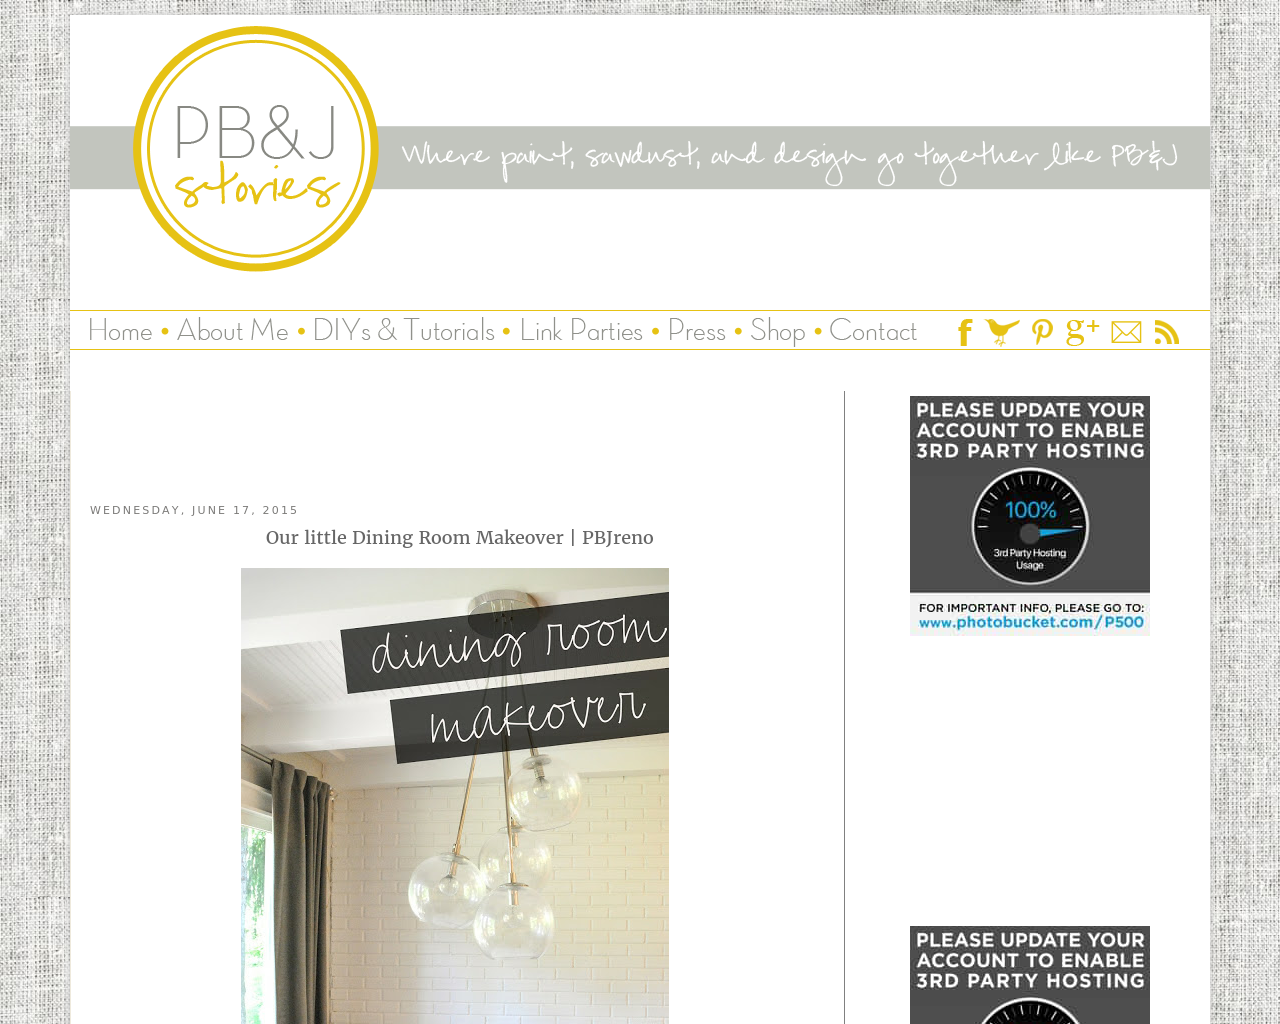 PB&J-Stories-Advertising-Reviews-Pricing